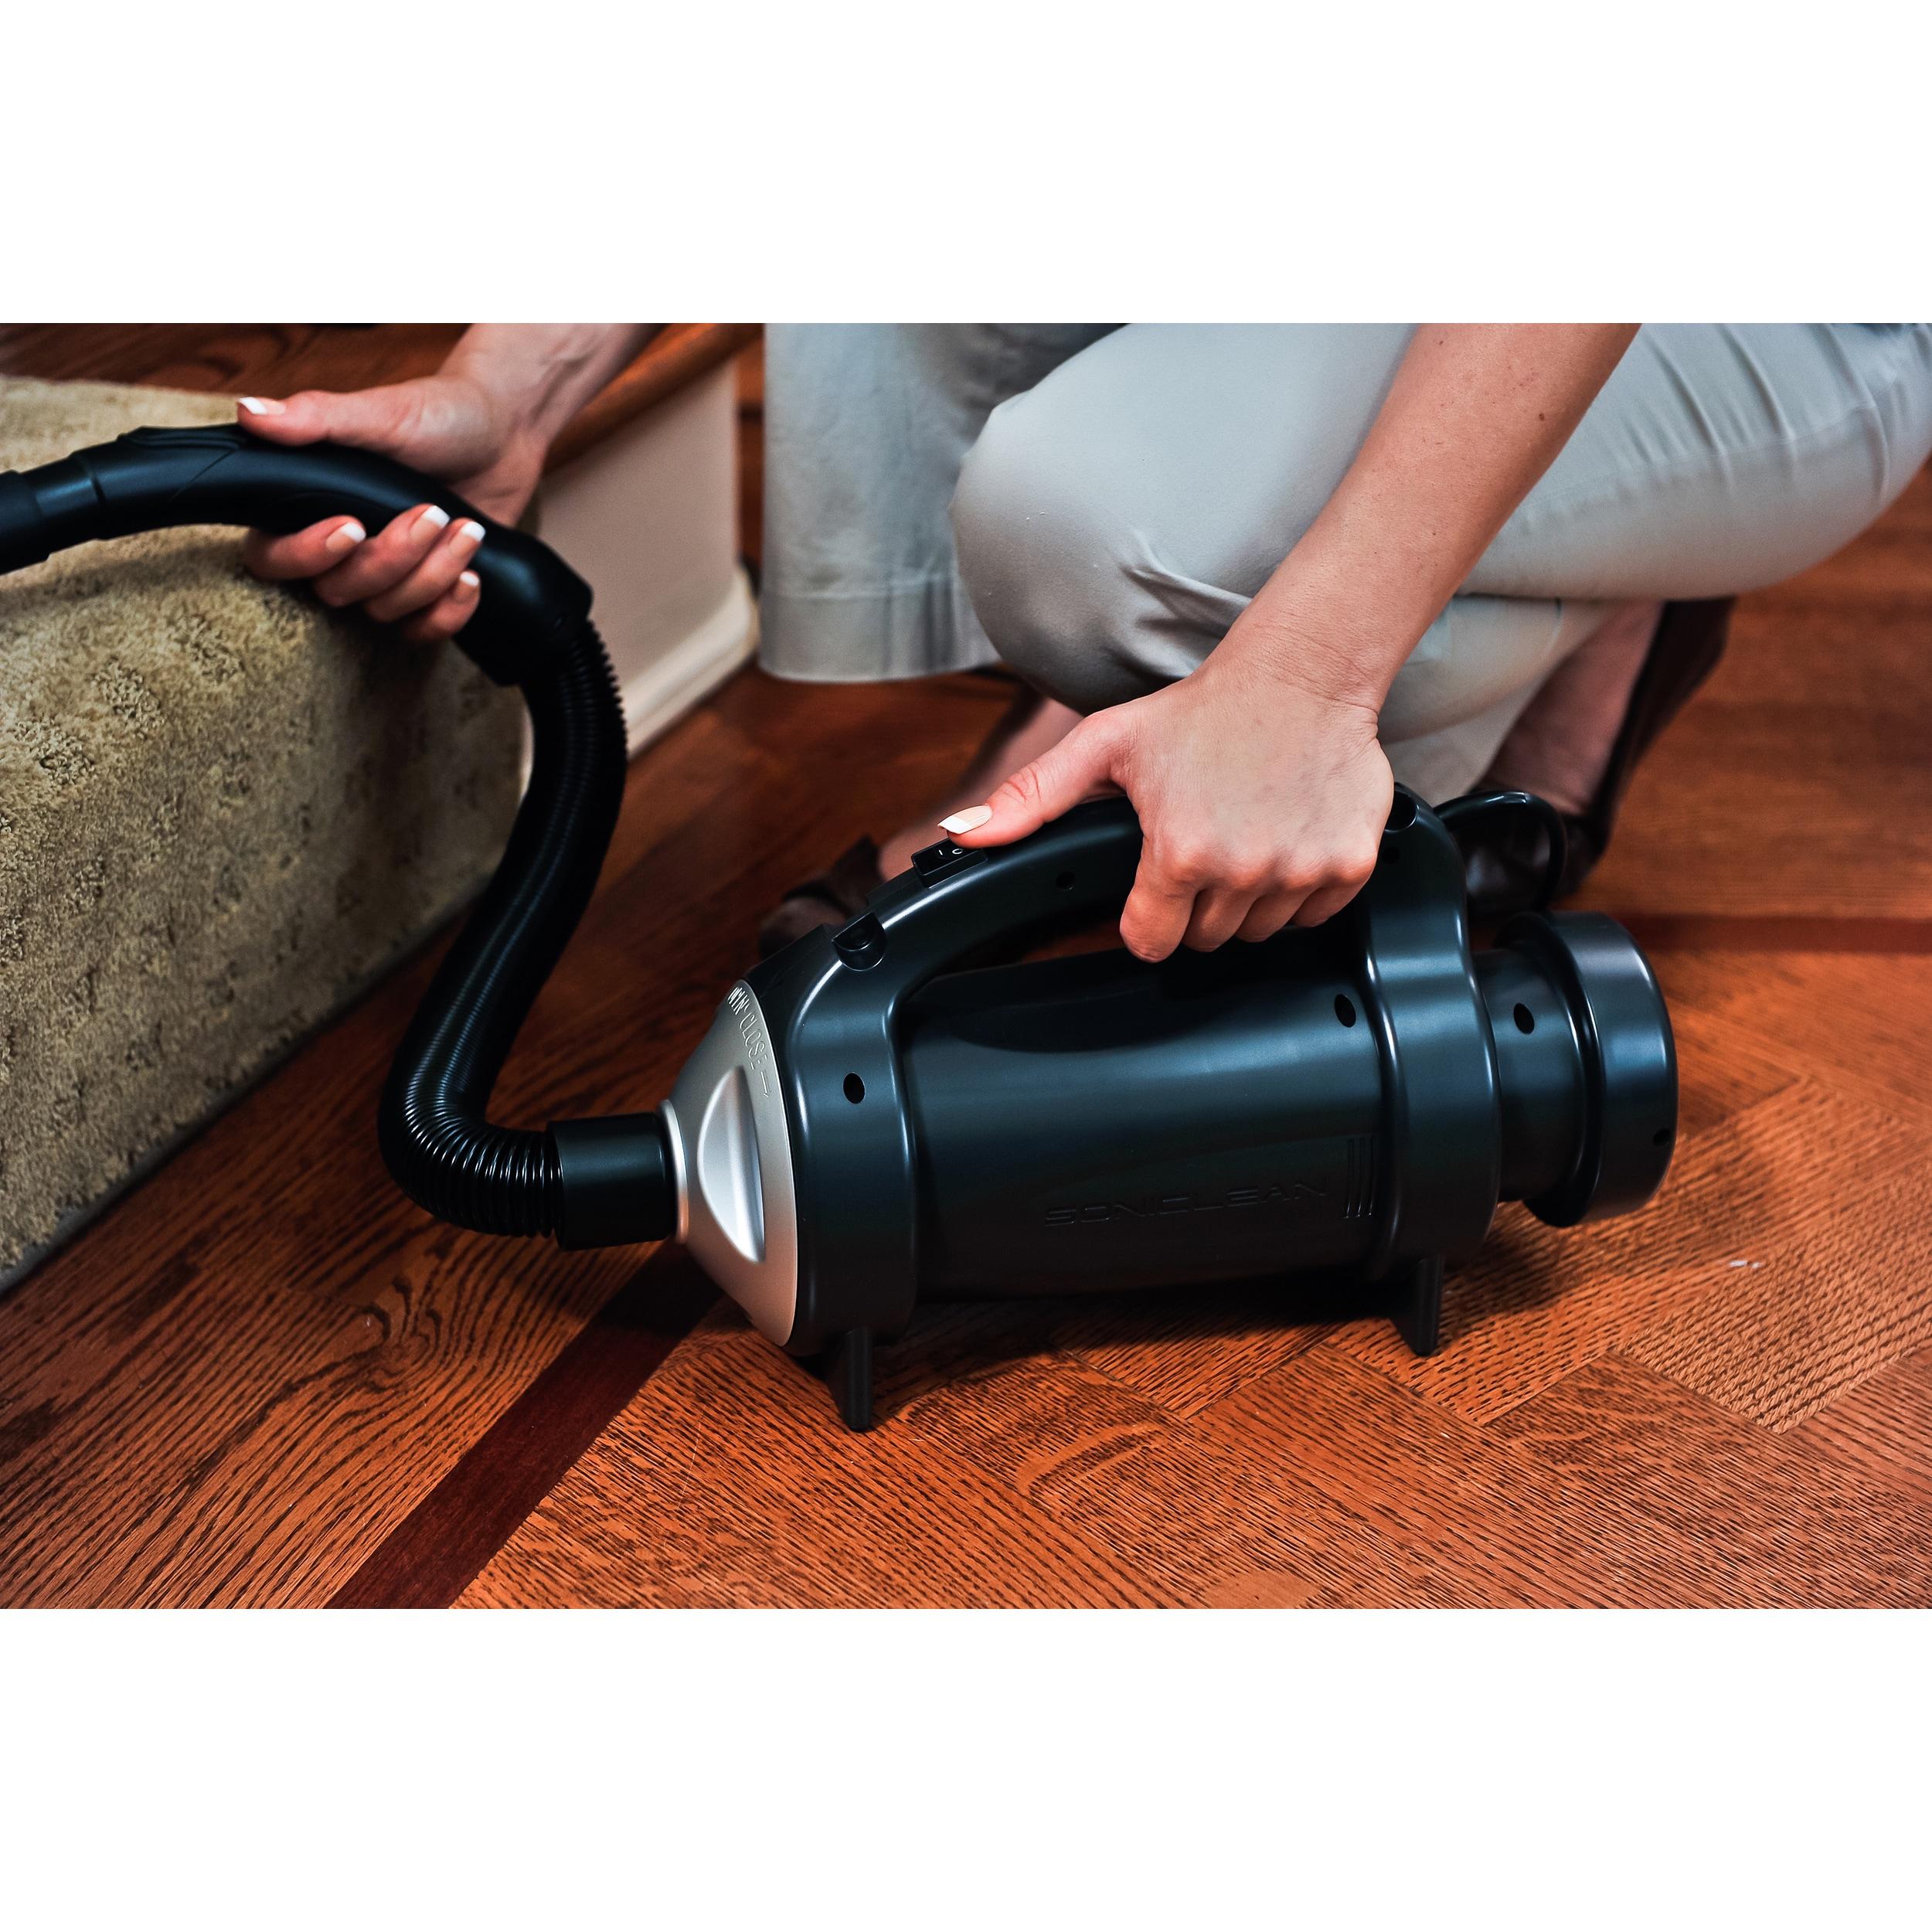 Soniclean HH 0800 Handheld Vacuum Cleaner